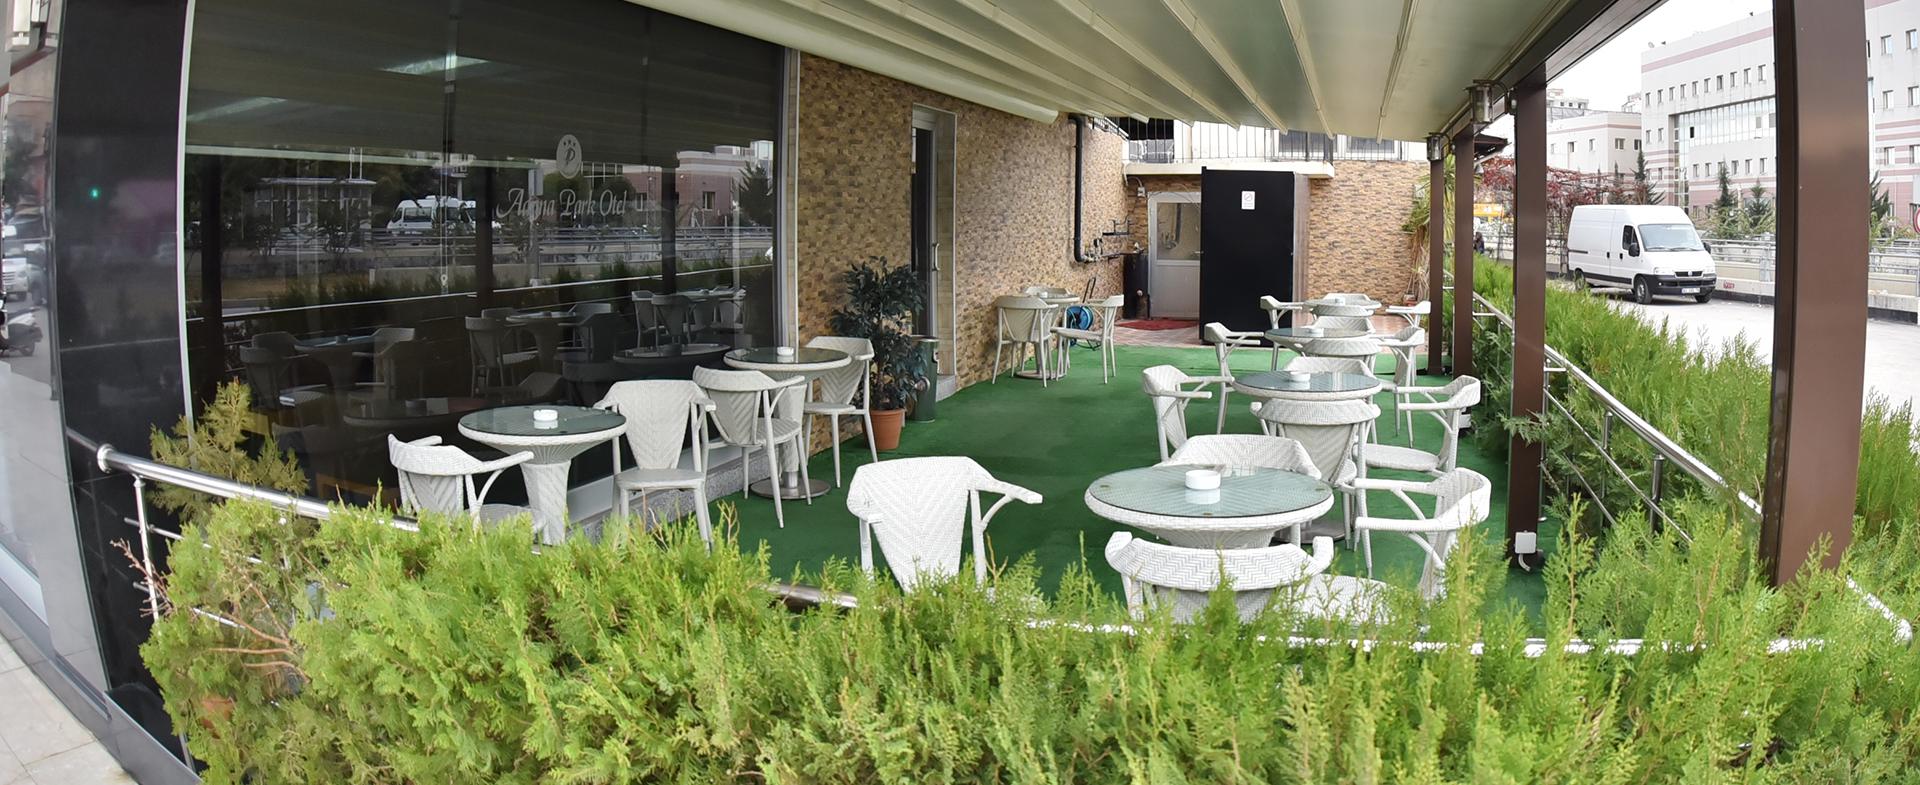 Adana Park Otel Slider -5